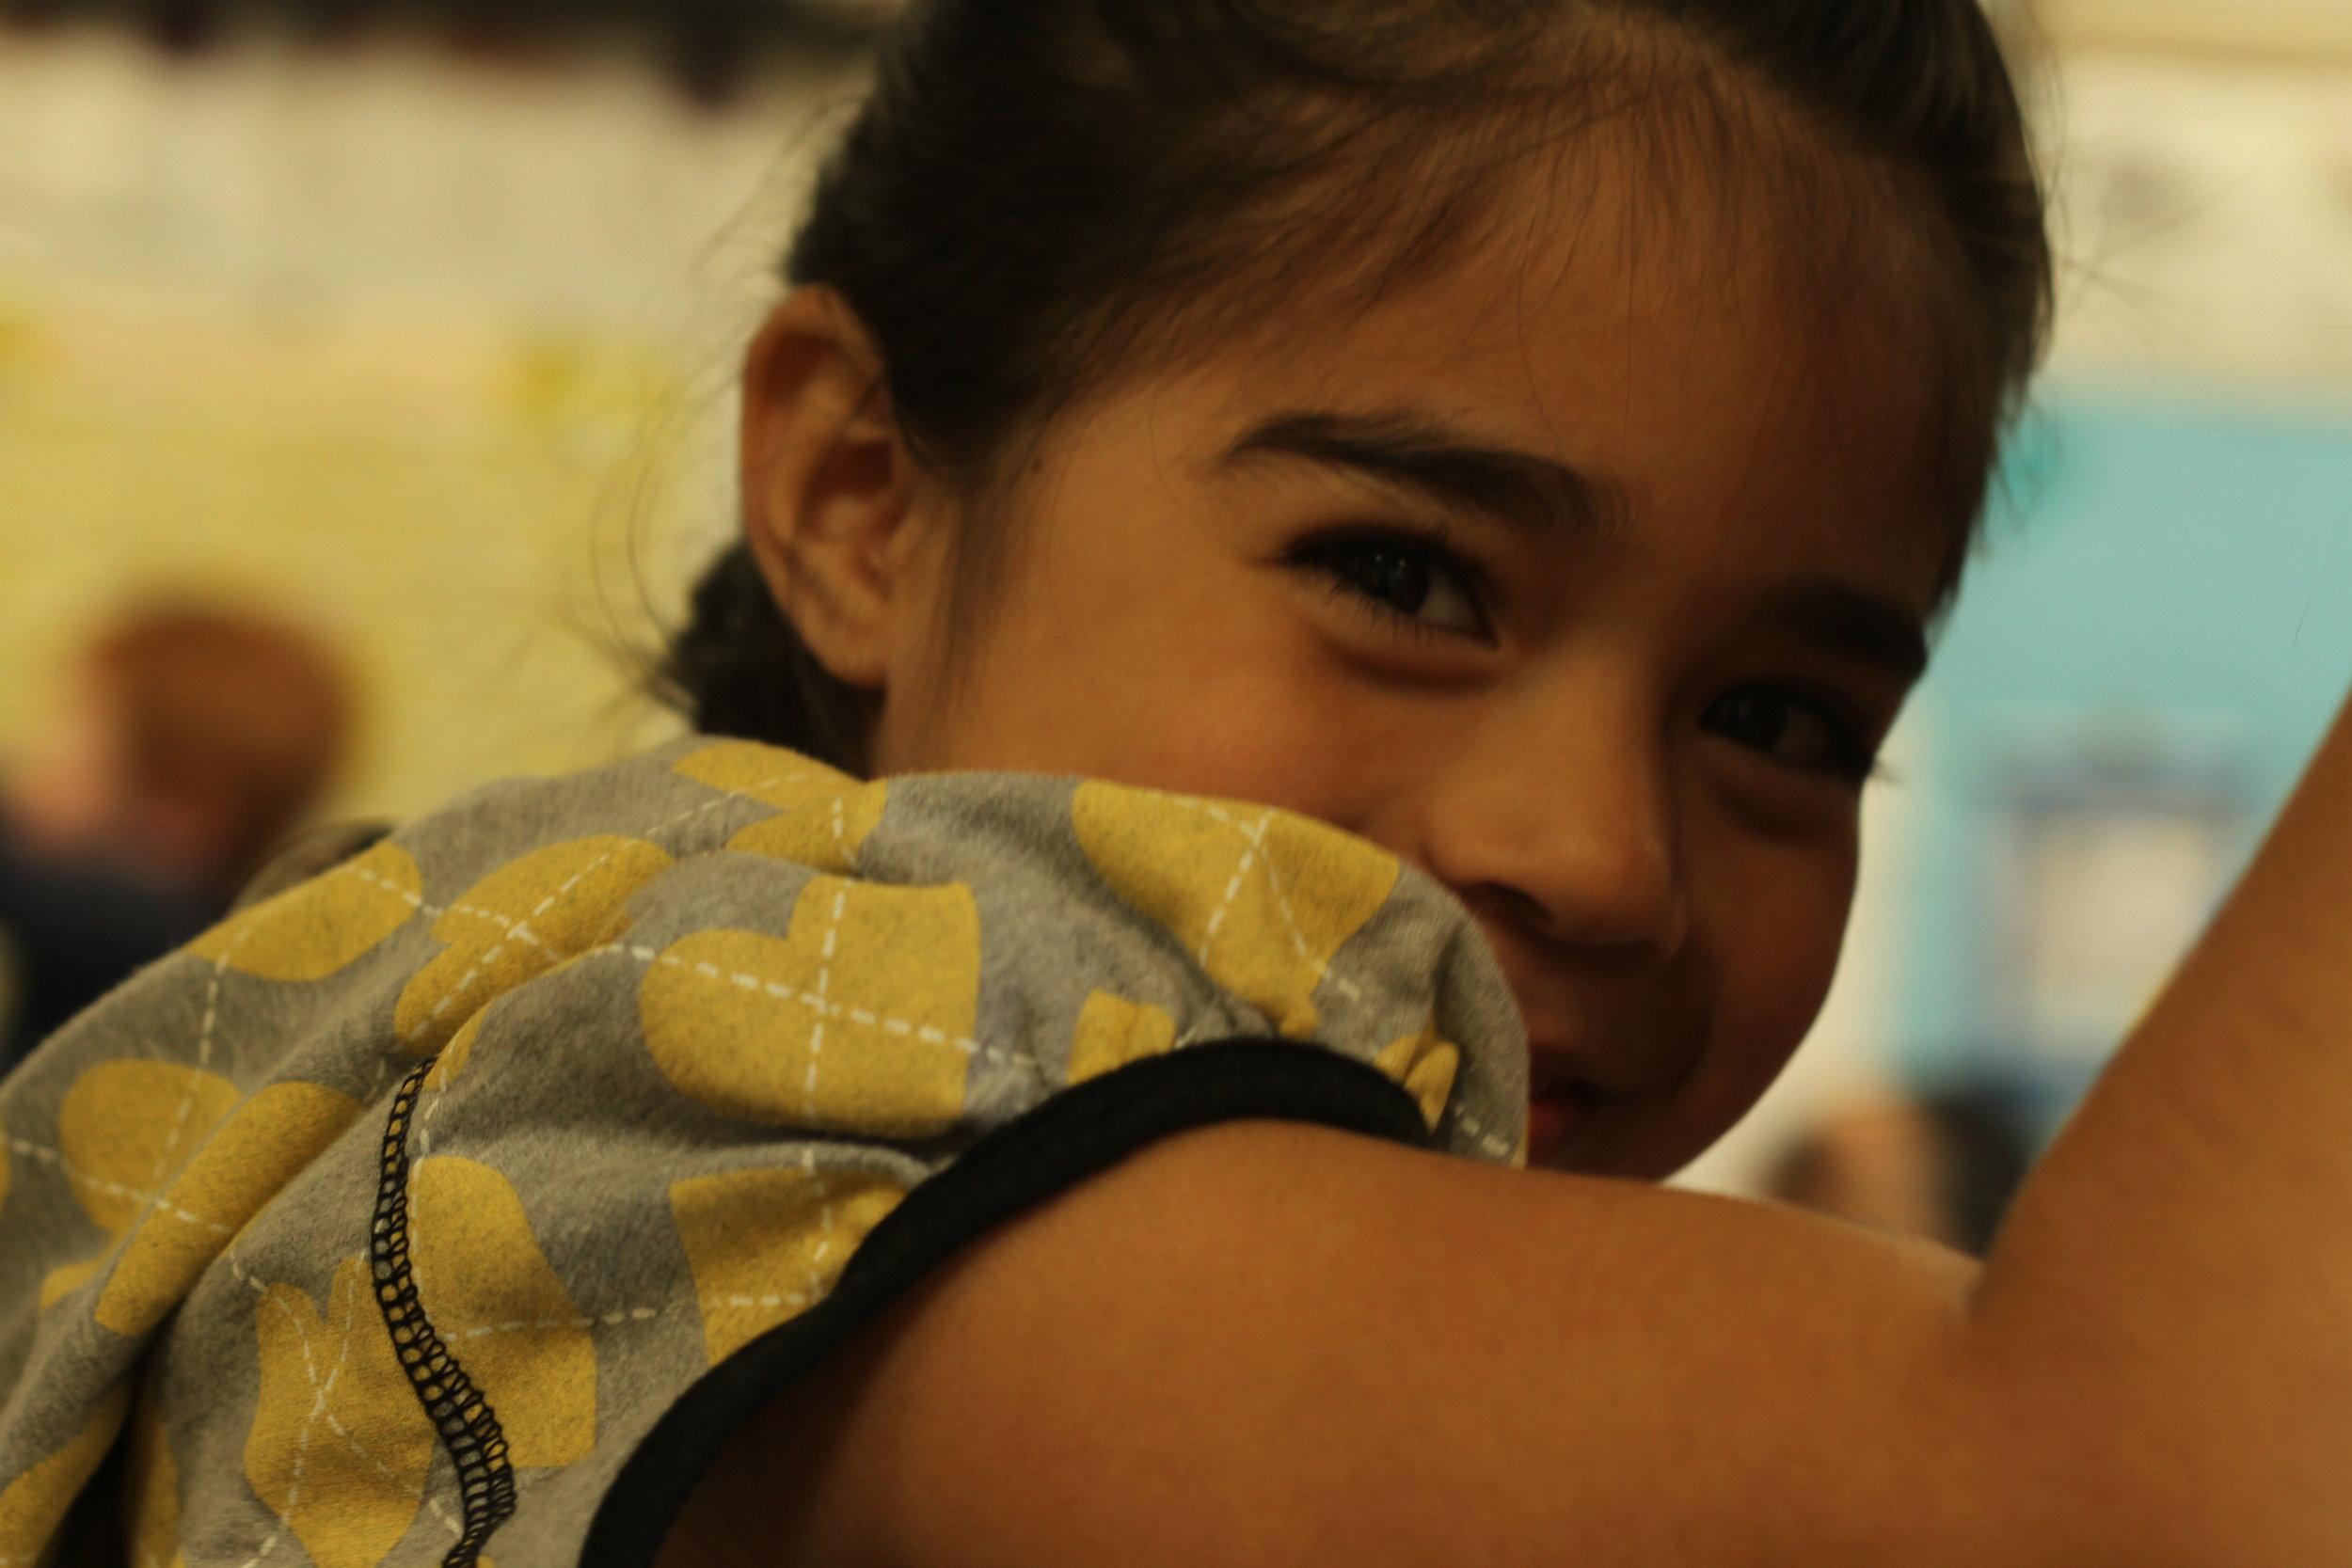 Yellow Checkered Girl Closeup (2).jpg